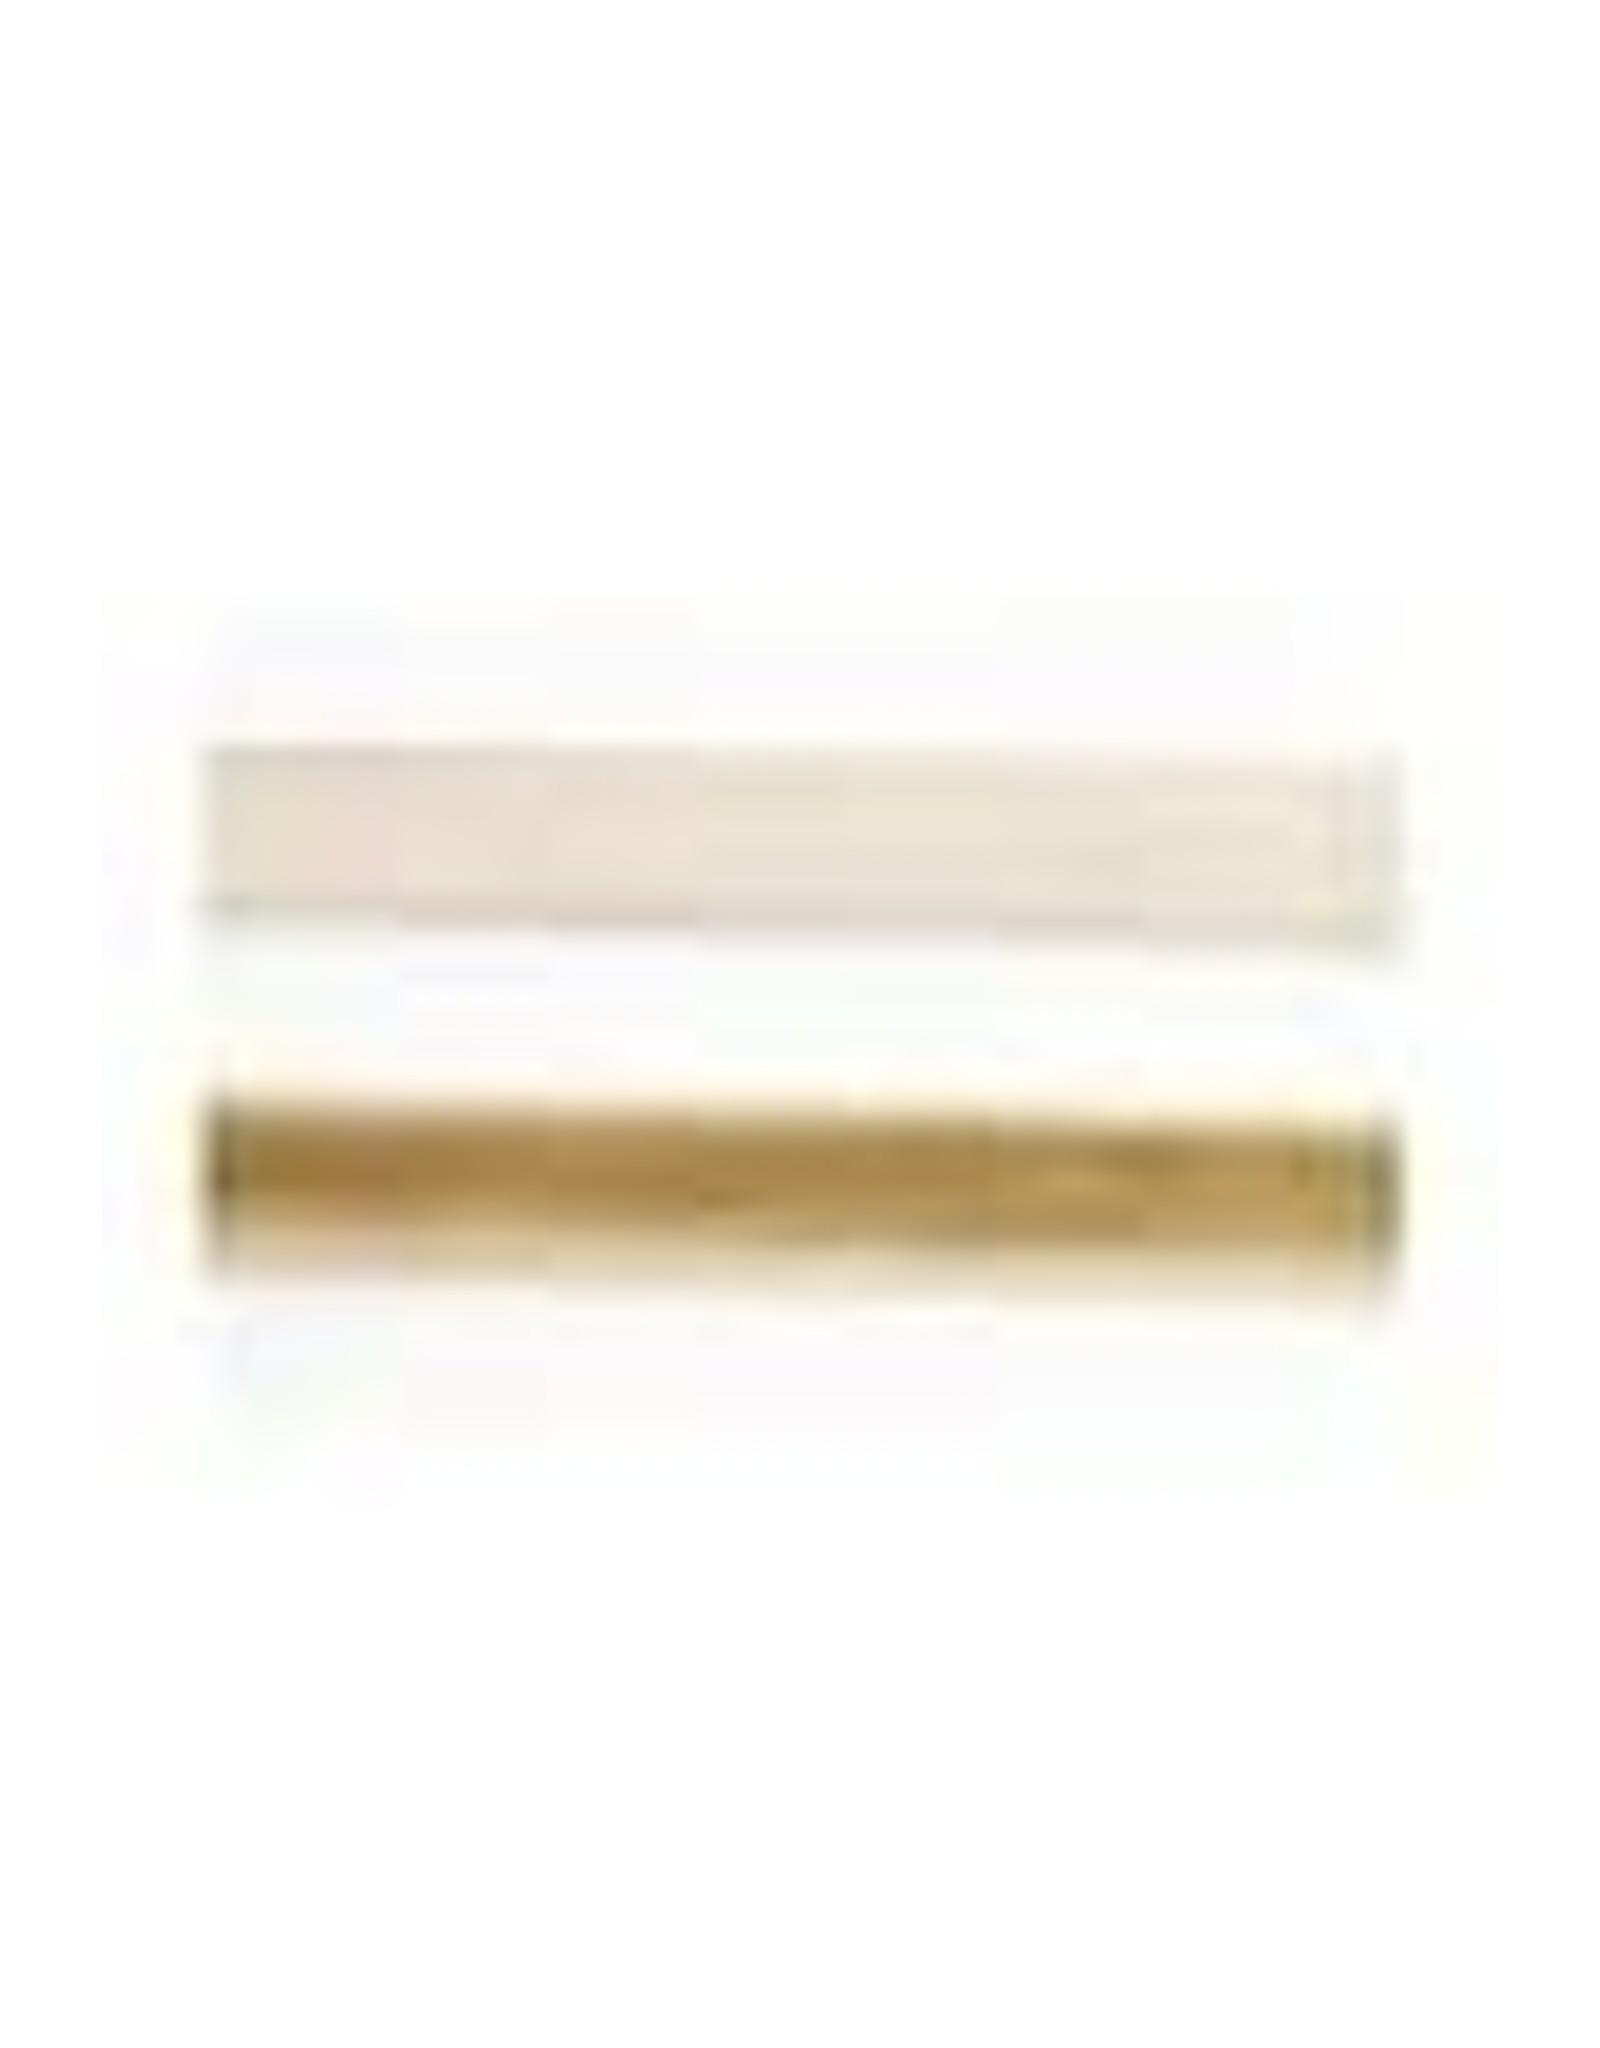 Fluweel lint beige ± 7mm breed (± 5 meter per rol)